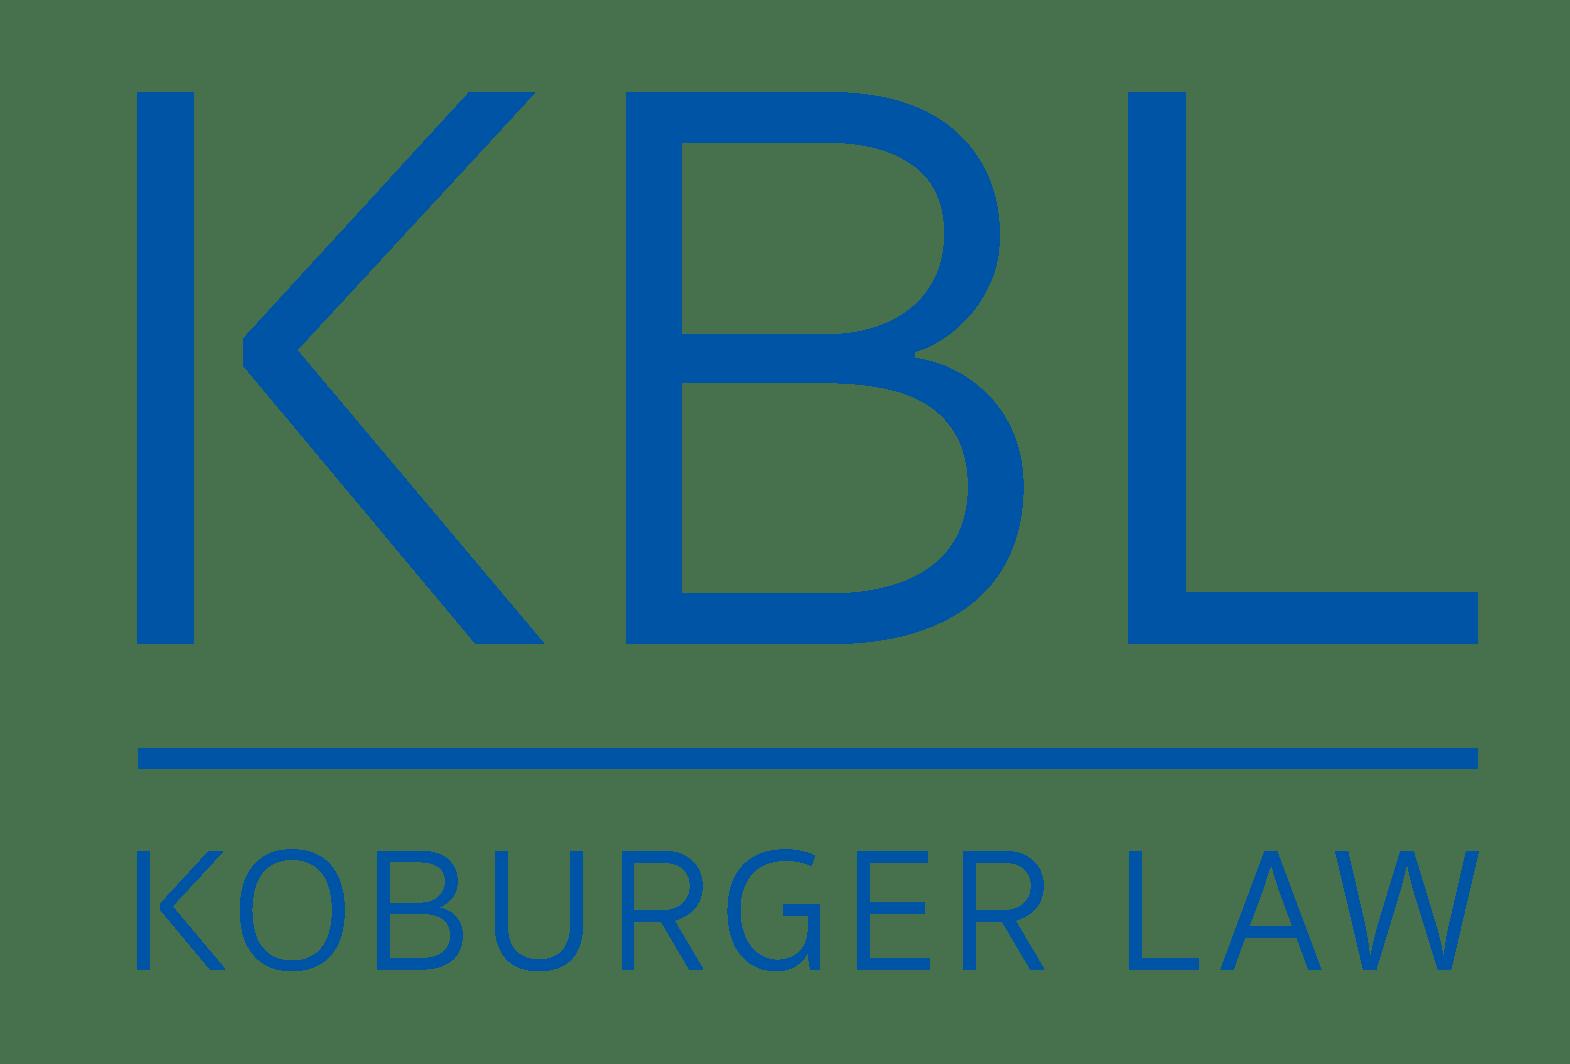 koburger law